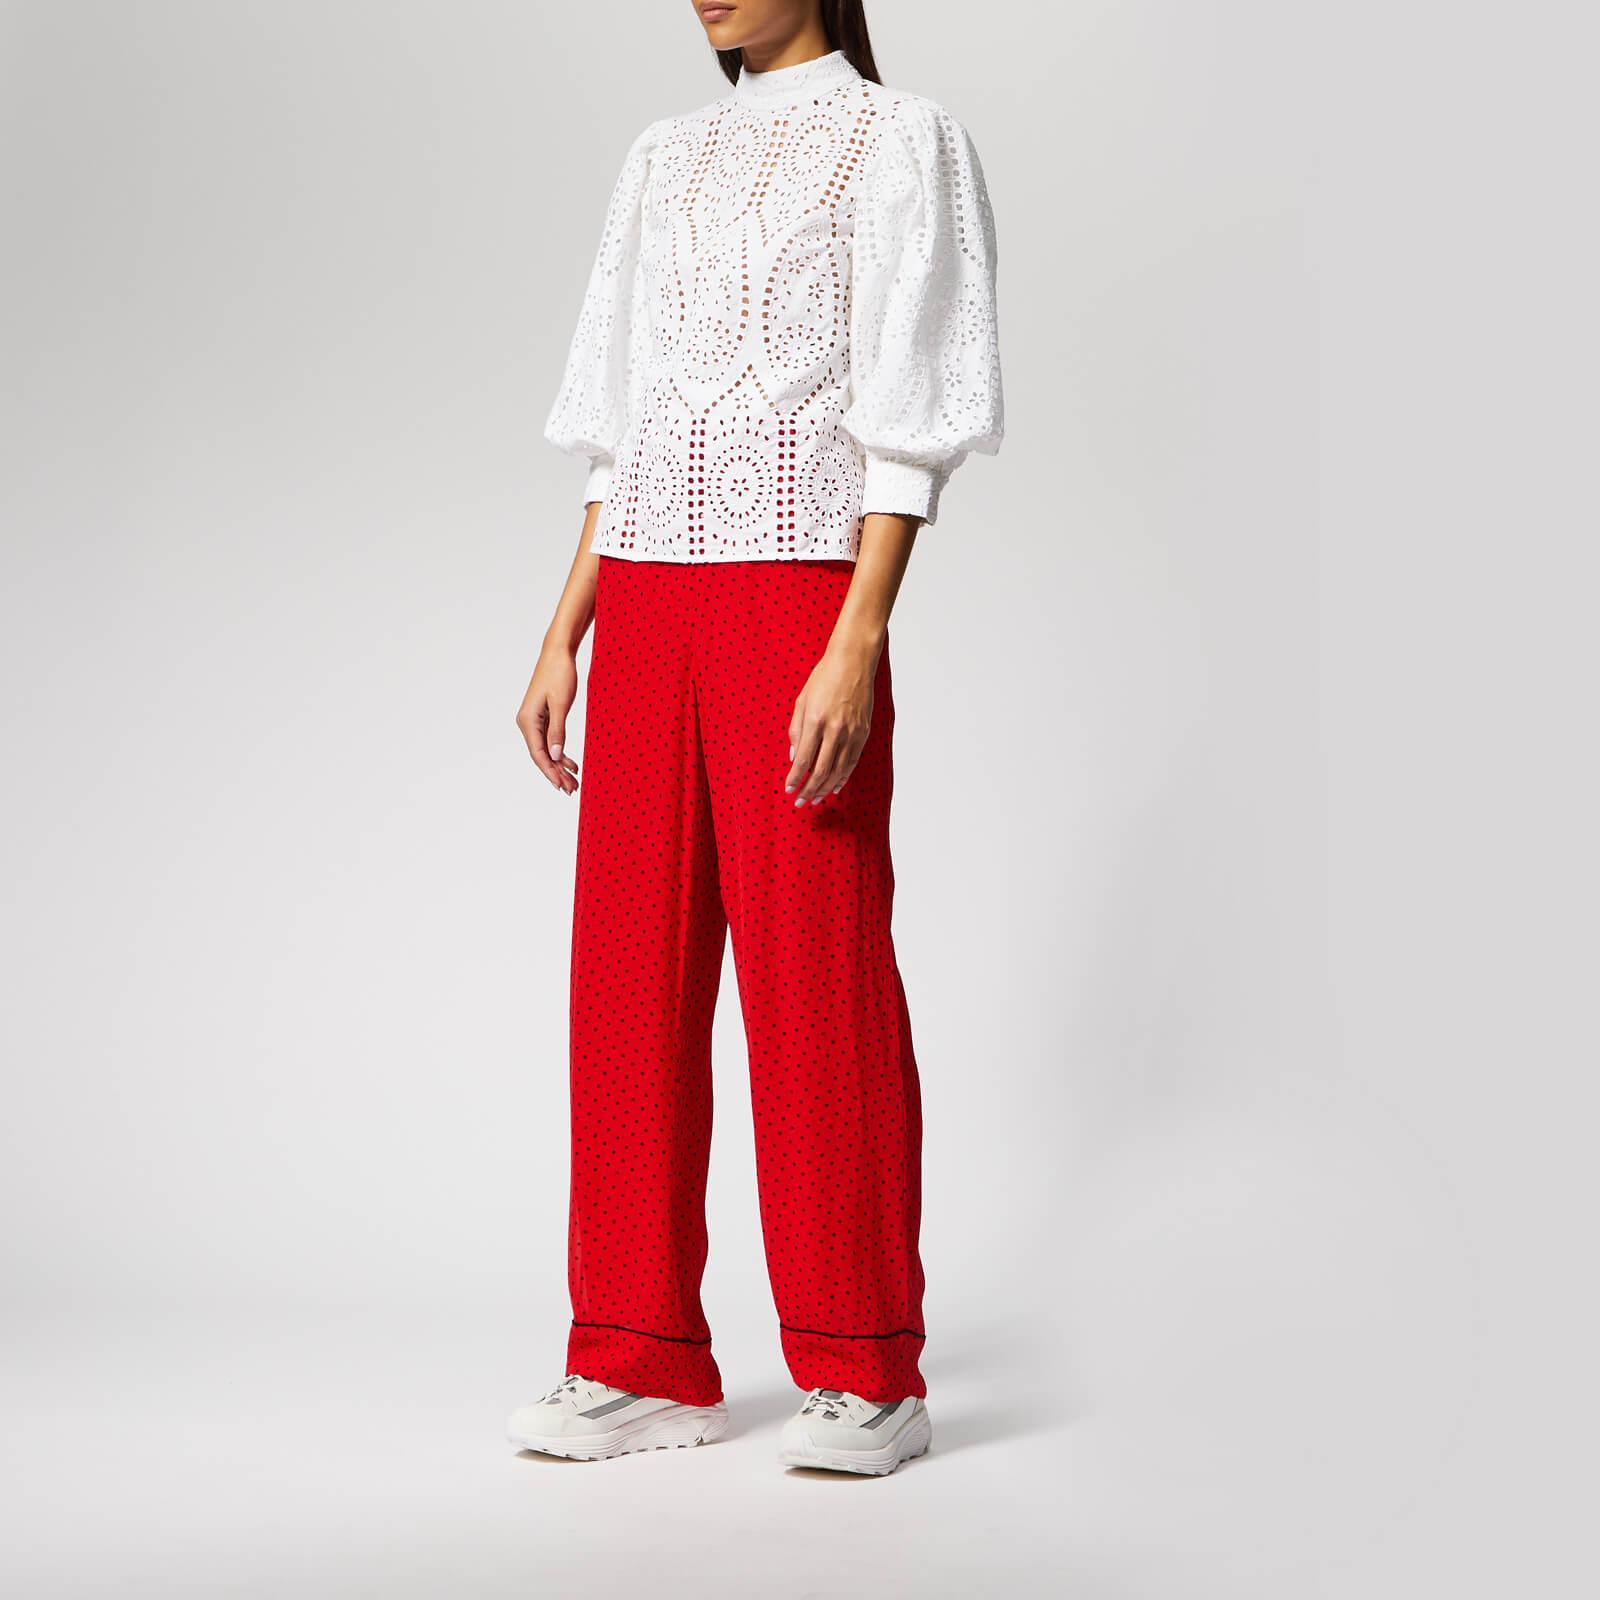 7b055661 Ganni Mullin Georgette Trousers in Red - Lyst